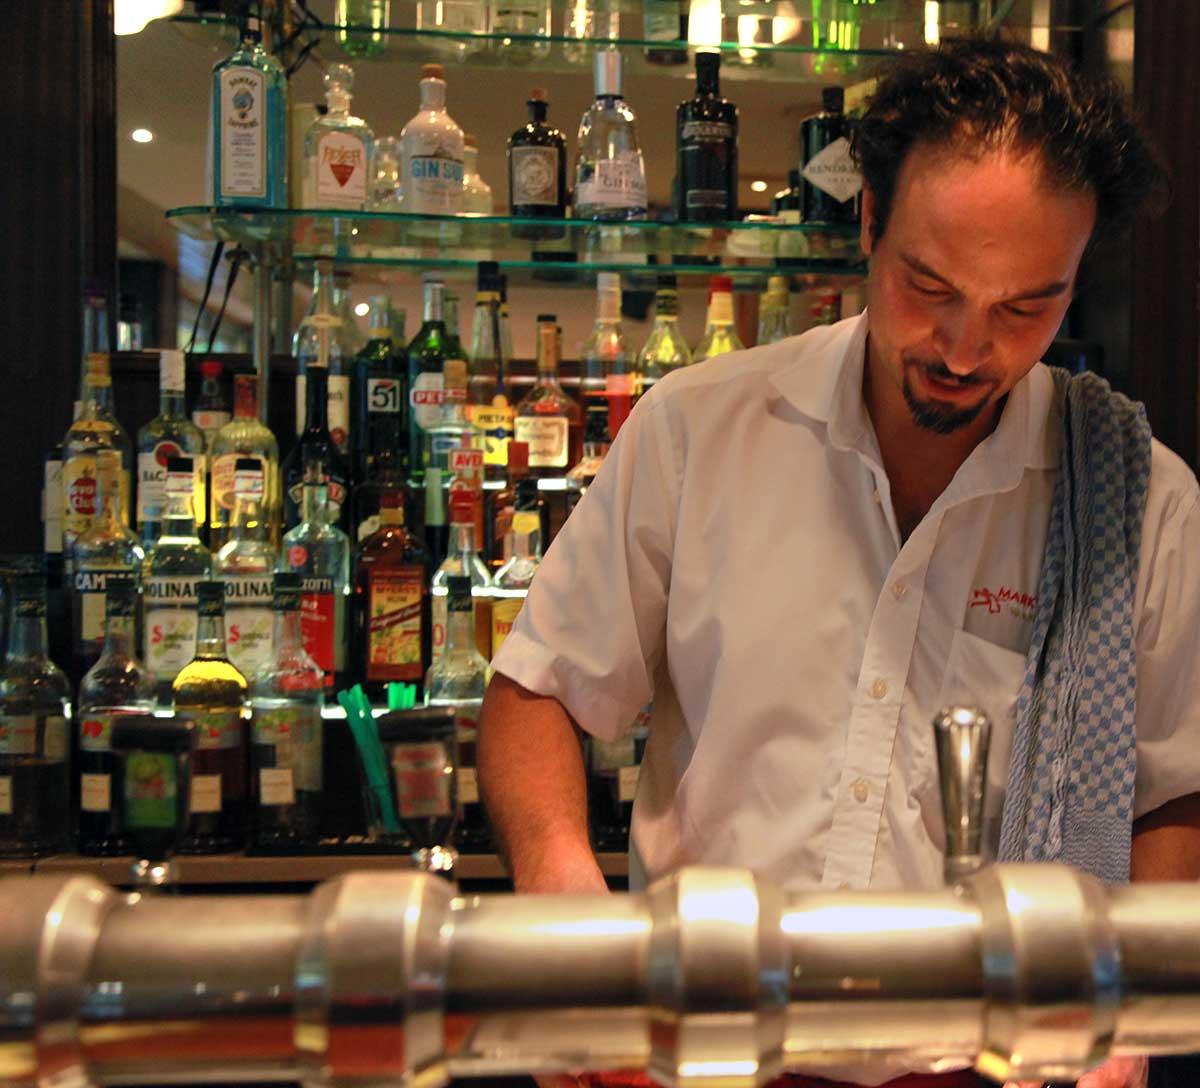 Pariser-Theke-Gin-Auswahl